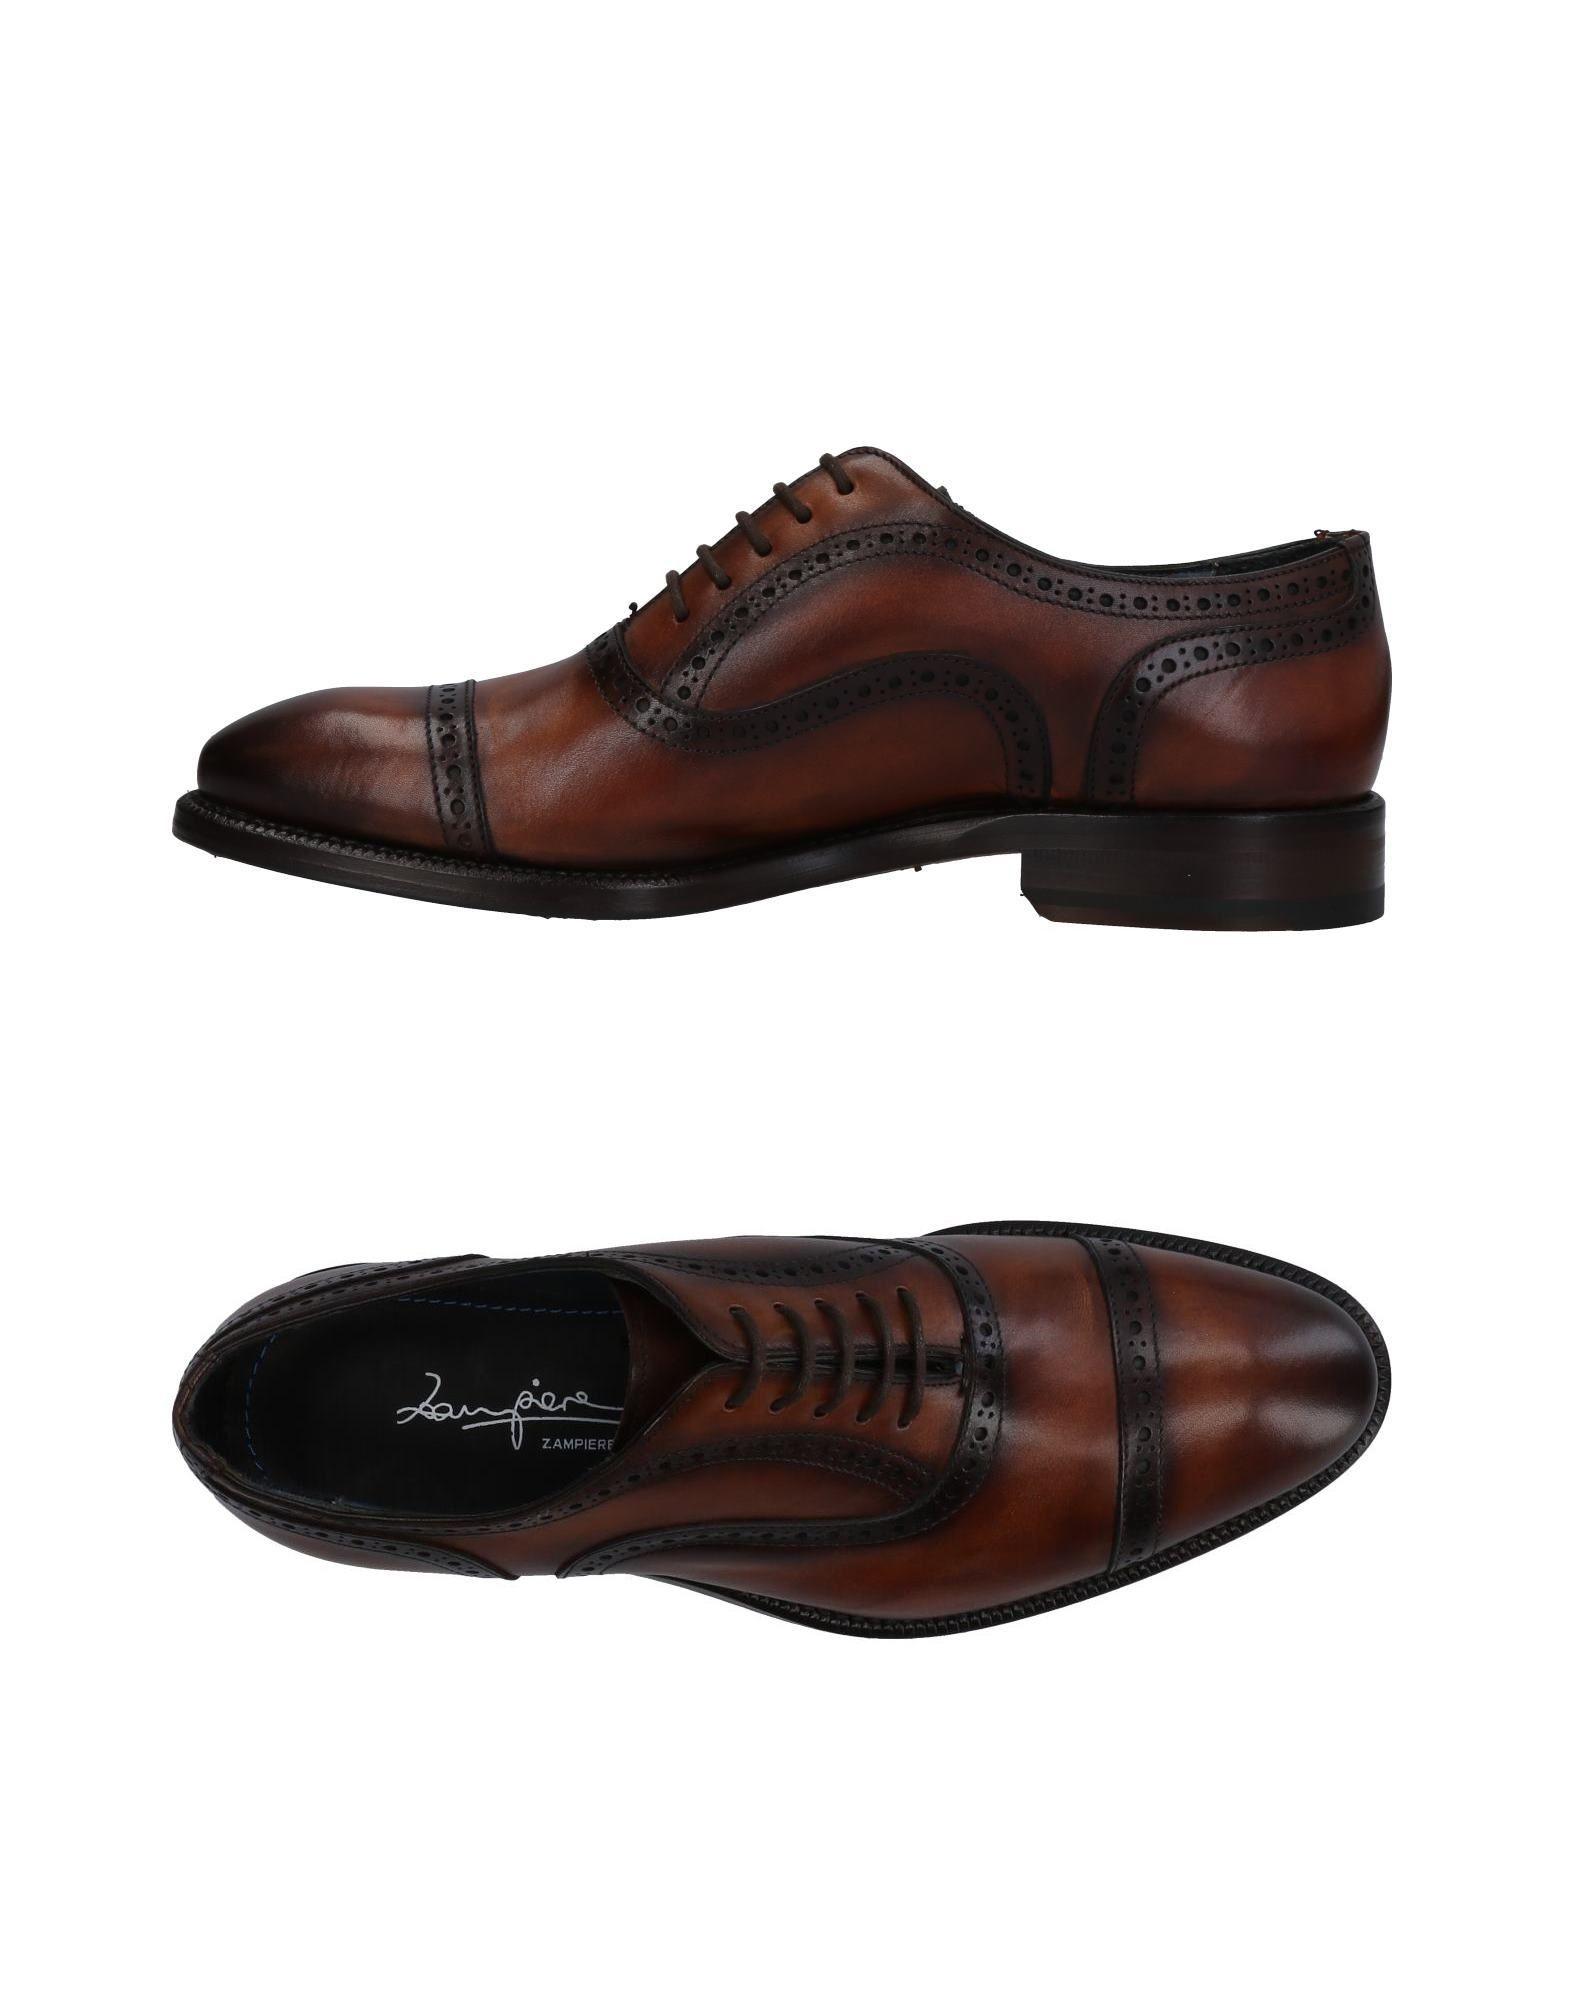 Rabatt echte Schuhe Zampiere Schnürschuhe Herren  11457063QM